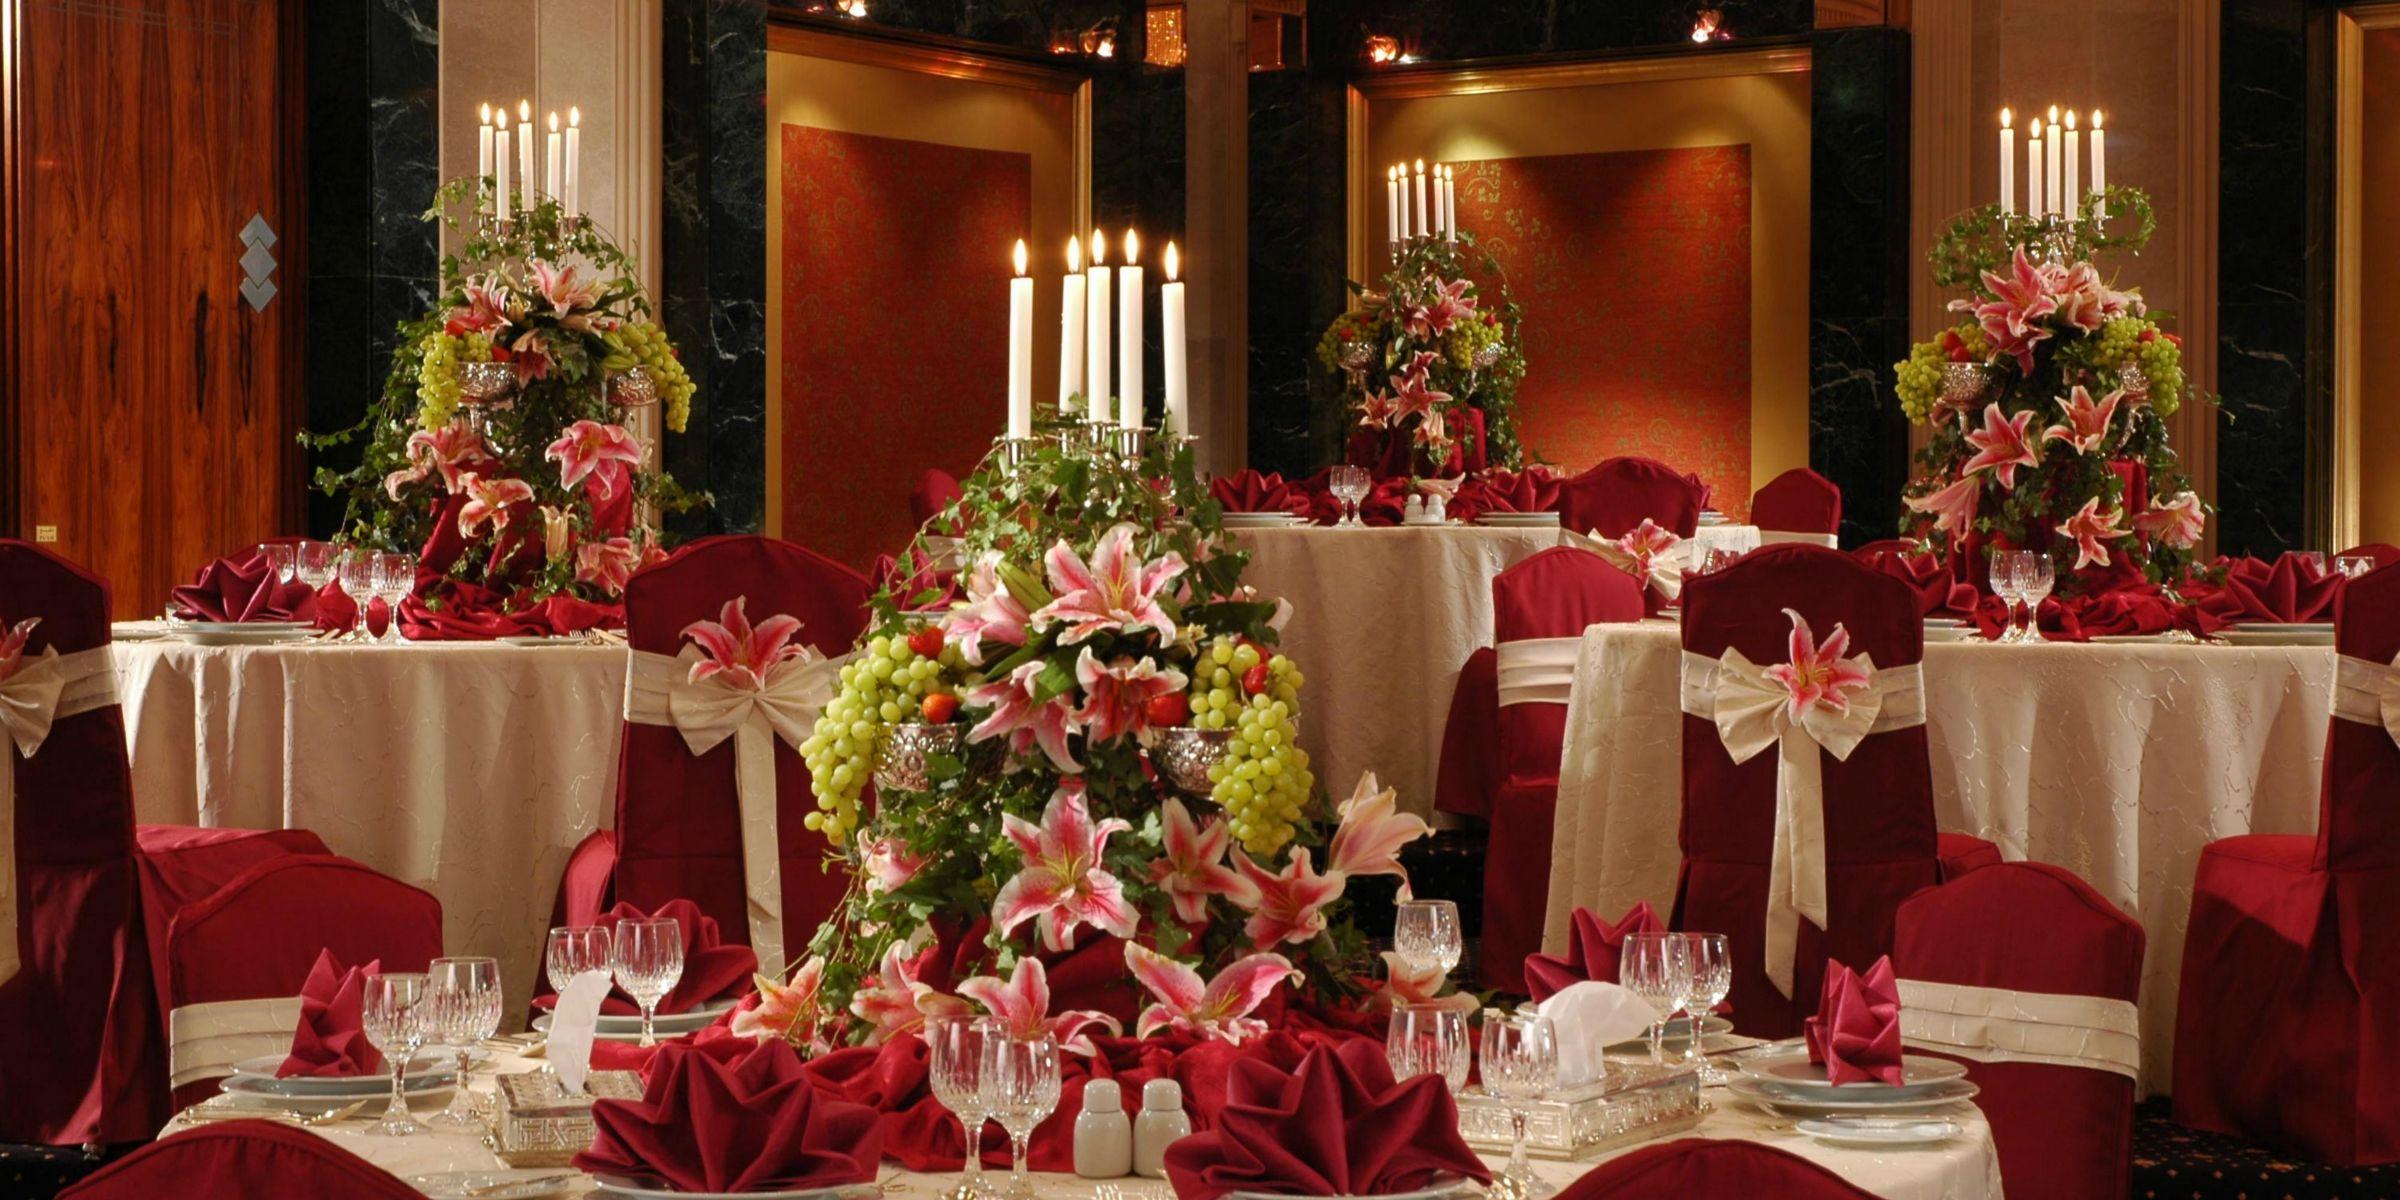 Intercontinental jeddah hotel meeting rooms wedding rentals salo de eventos junglespirit Choice Image